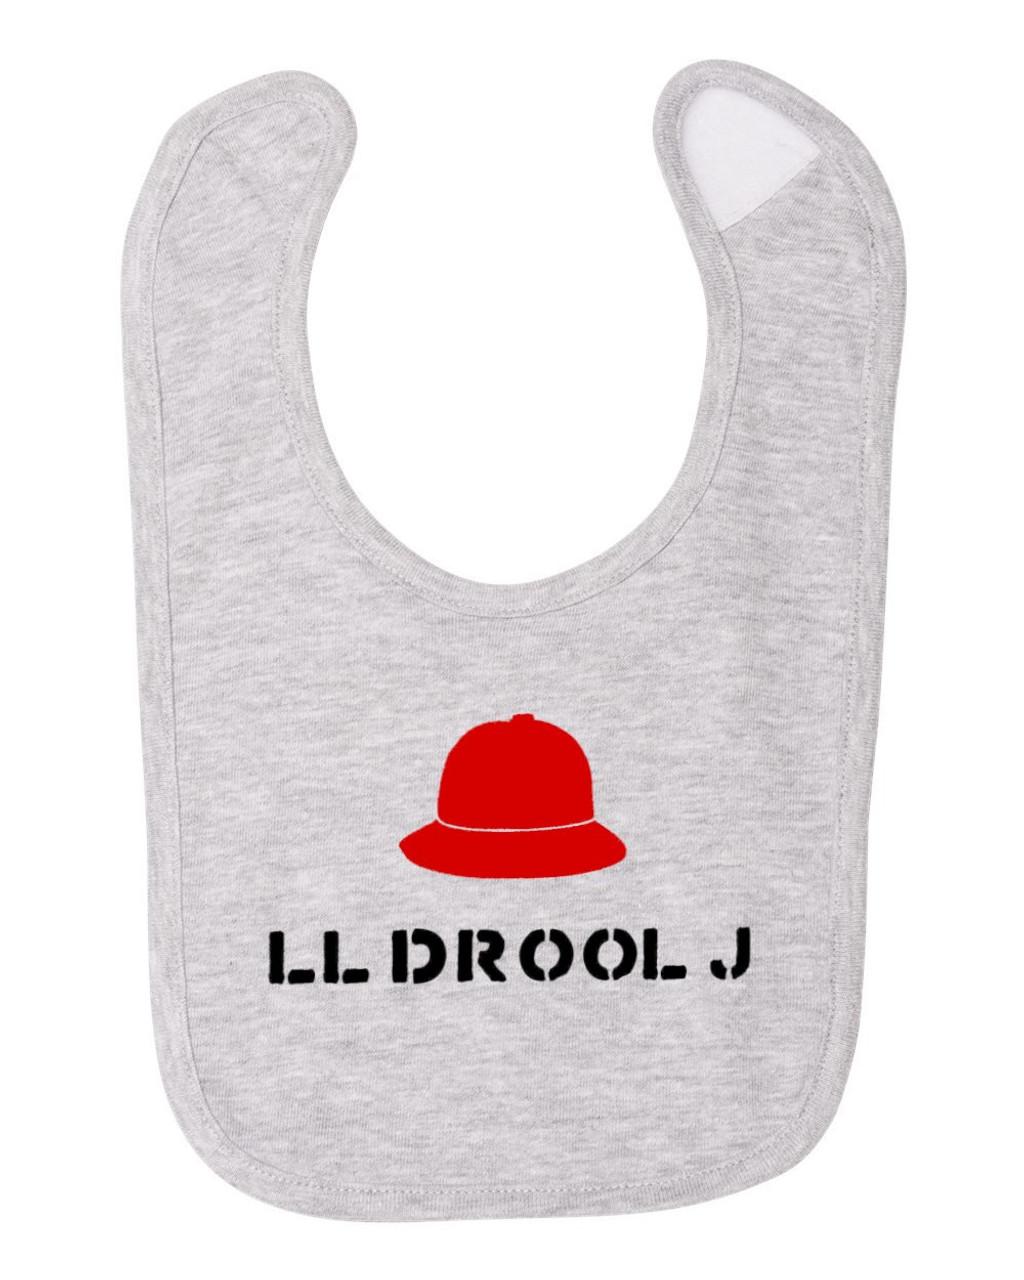 LL Drool J Rap Hip Hop Cool Funny Baby Bib Cotton Child Apron & Smock